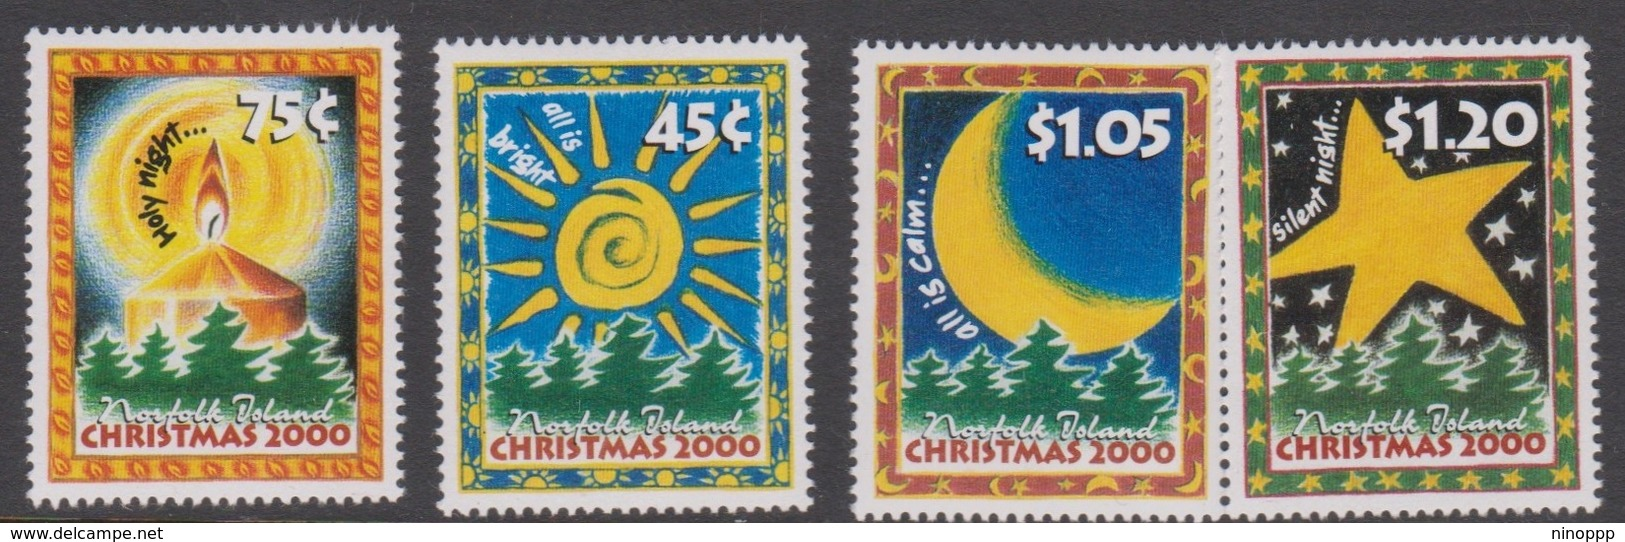 Norfolk Island ASC 726-729 2000 Christmas, Mint Never Hinged - Norfolk Island